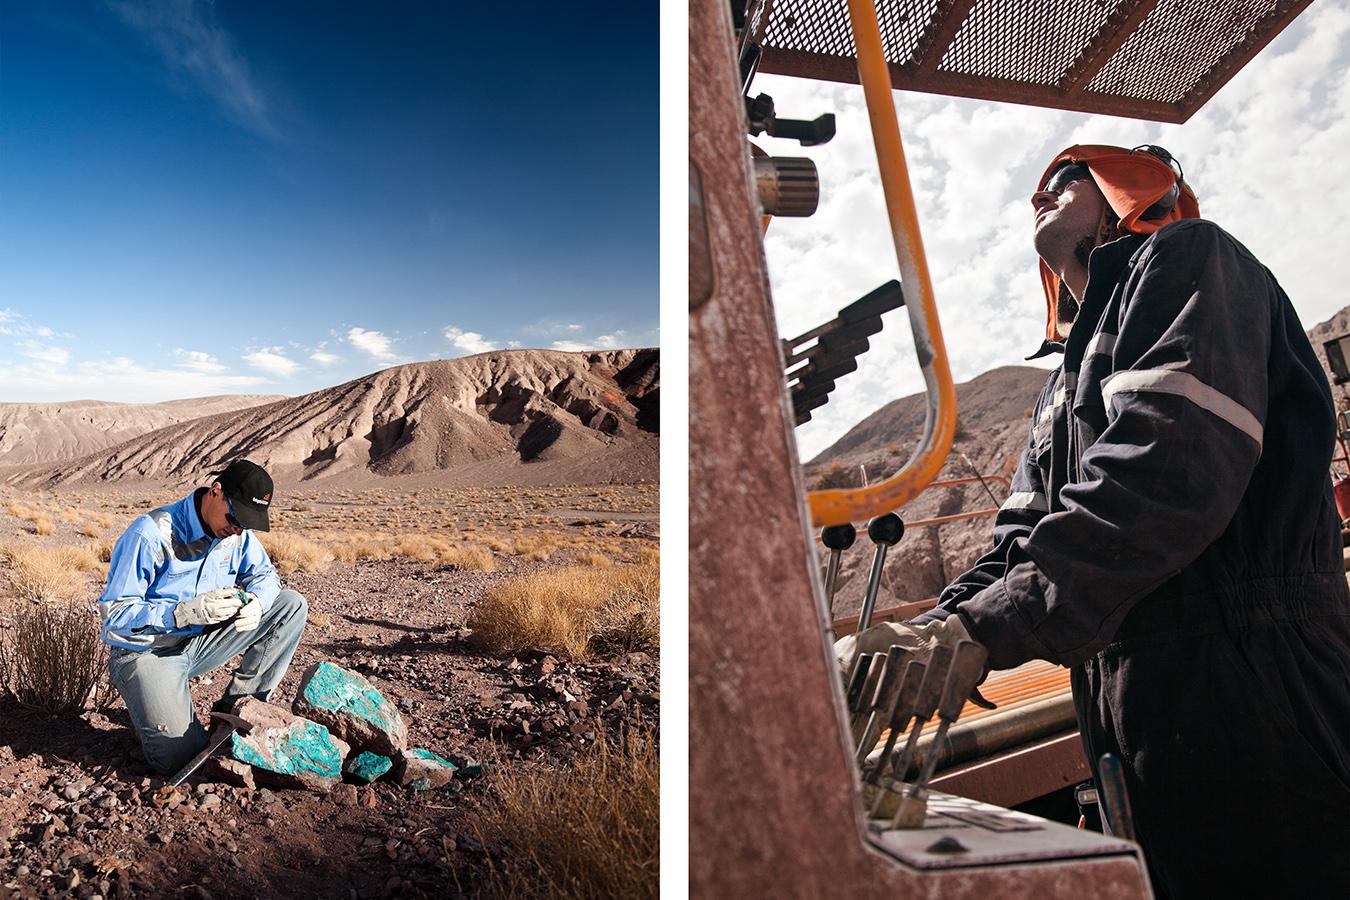 MINERAL EXPLORATION (MINEX) FOR BHP BILLITON, ATACAMA DESERT, CHILE